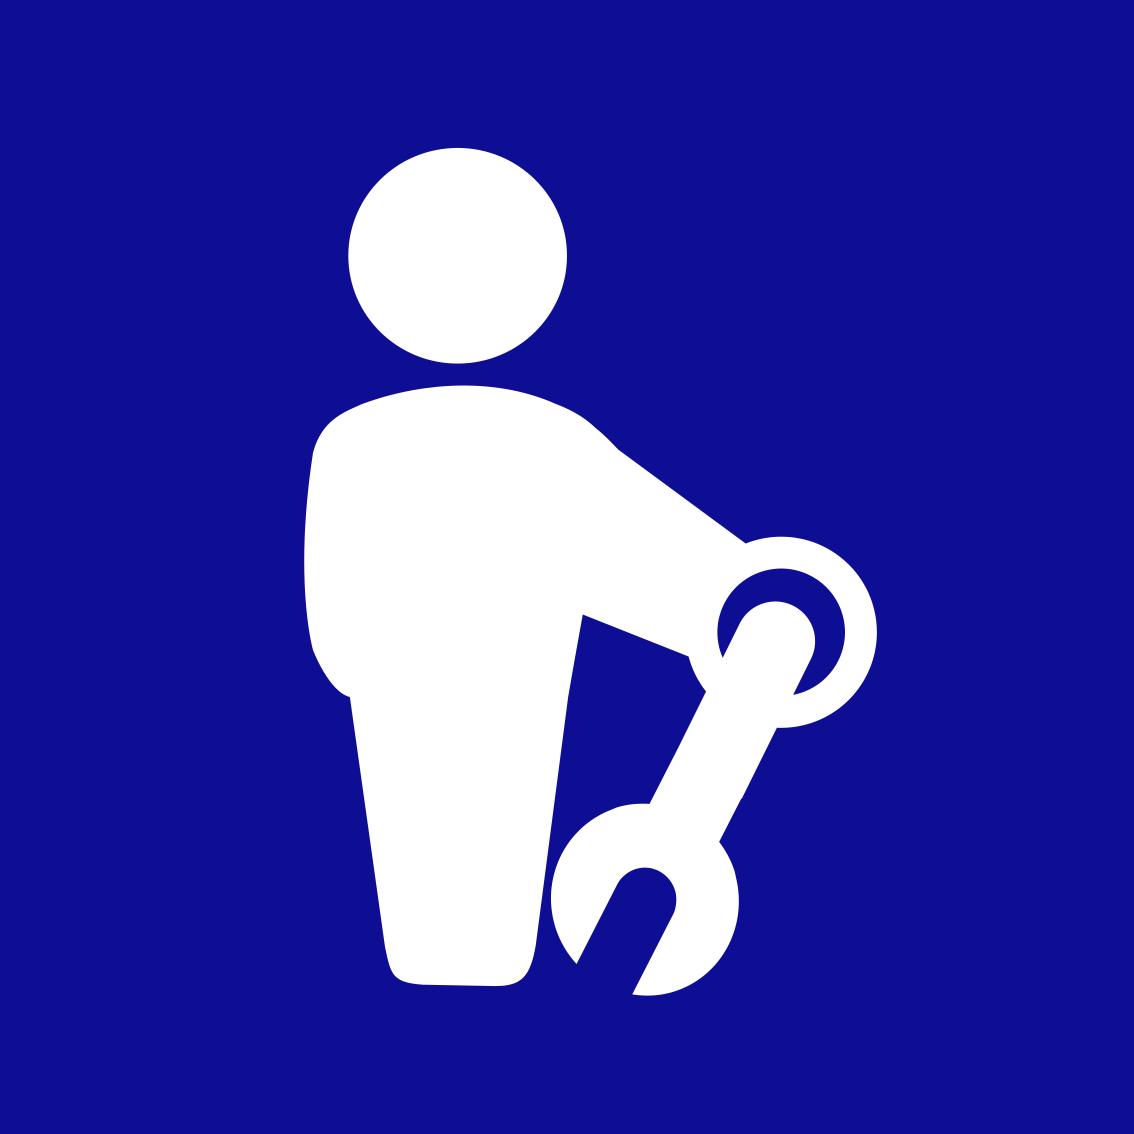 Colrobfood logo